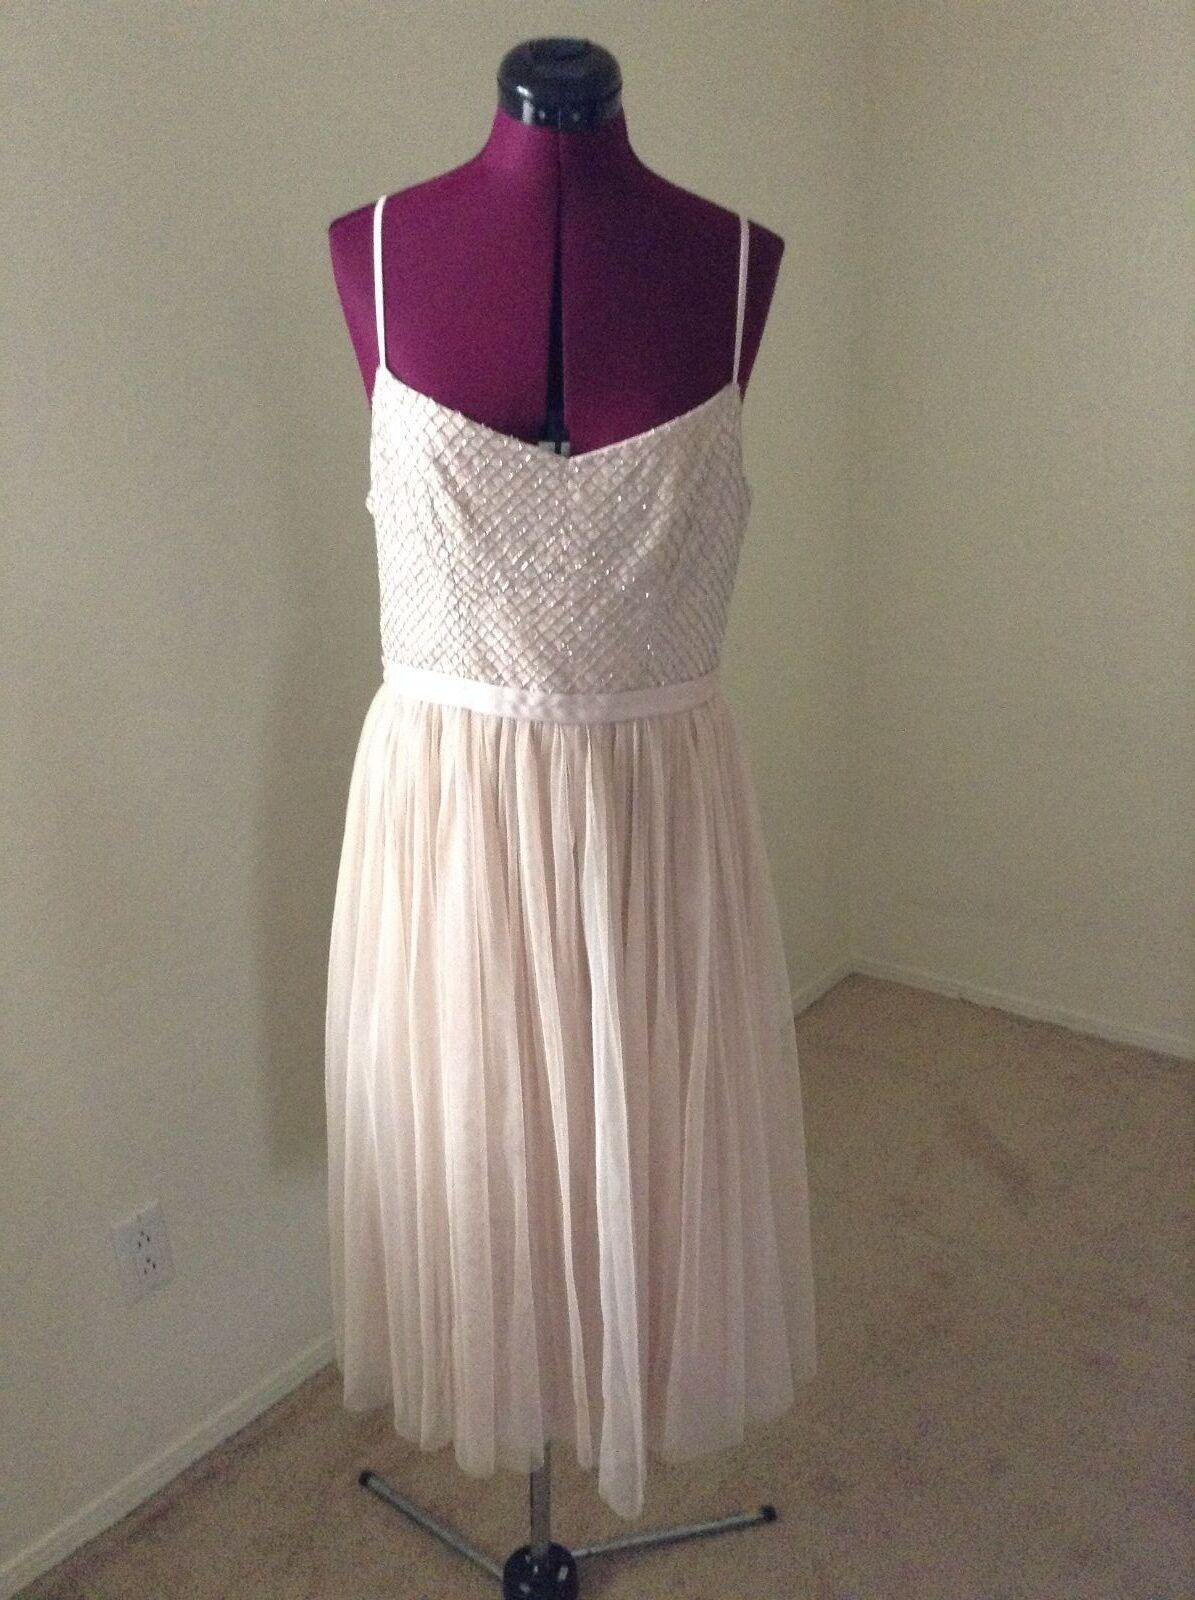 NEW Needle & Thread  260 Coppelia Ballet Embellished Tulle DressblueshSz 10